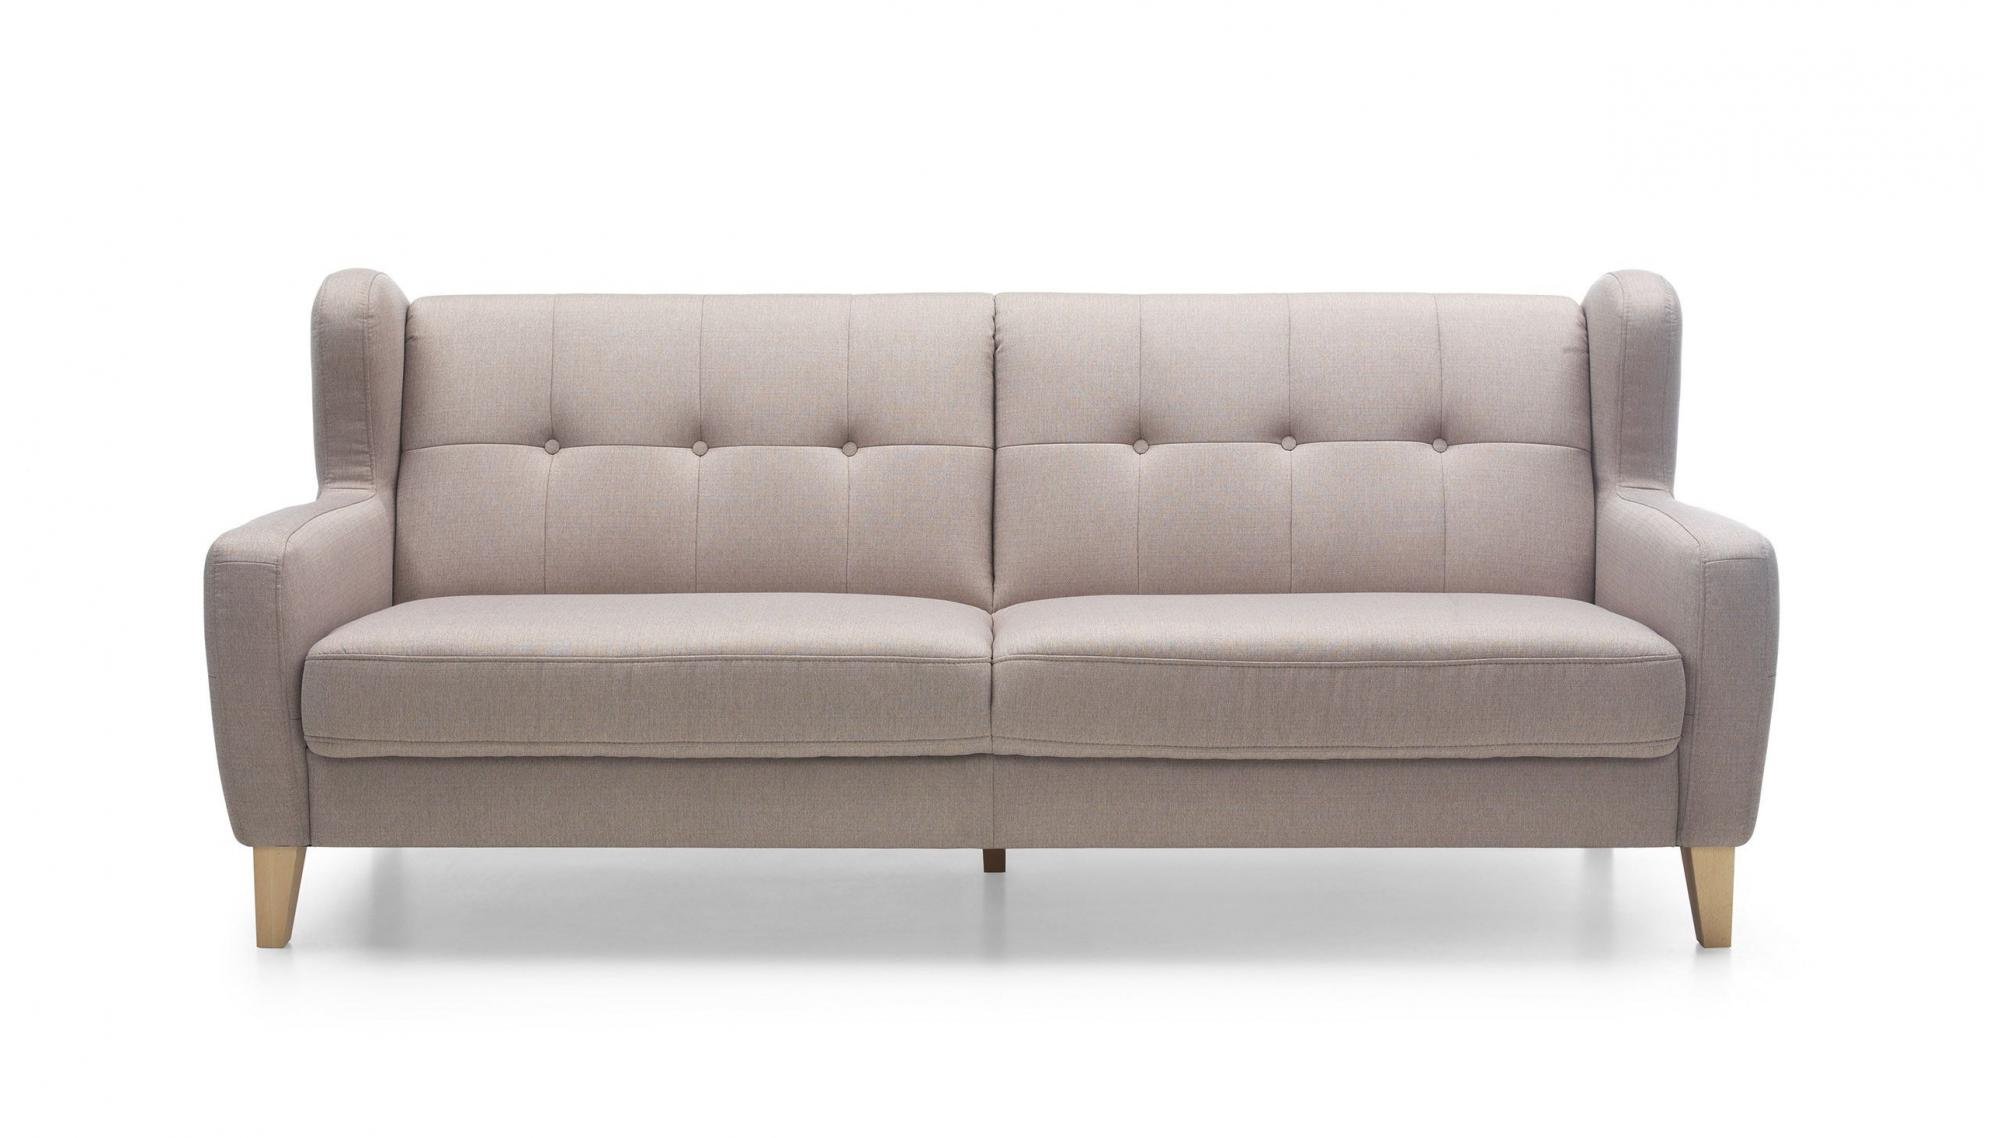 Innatura Sofa